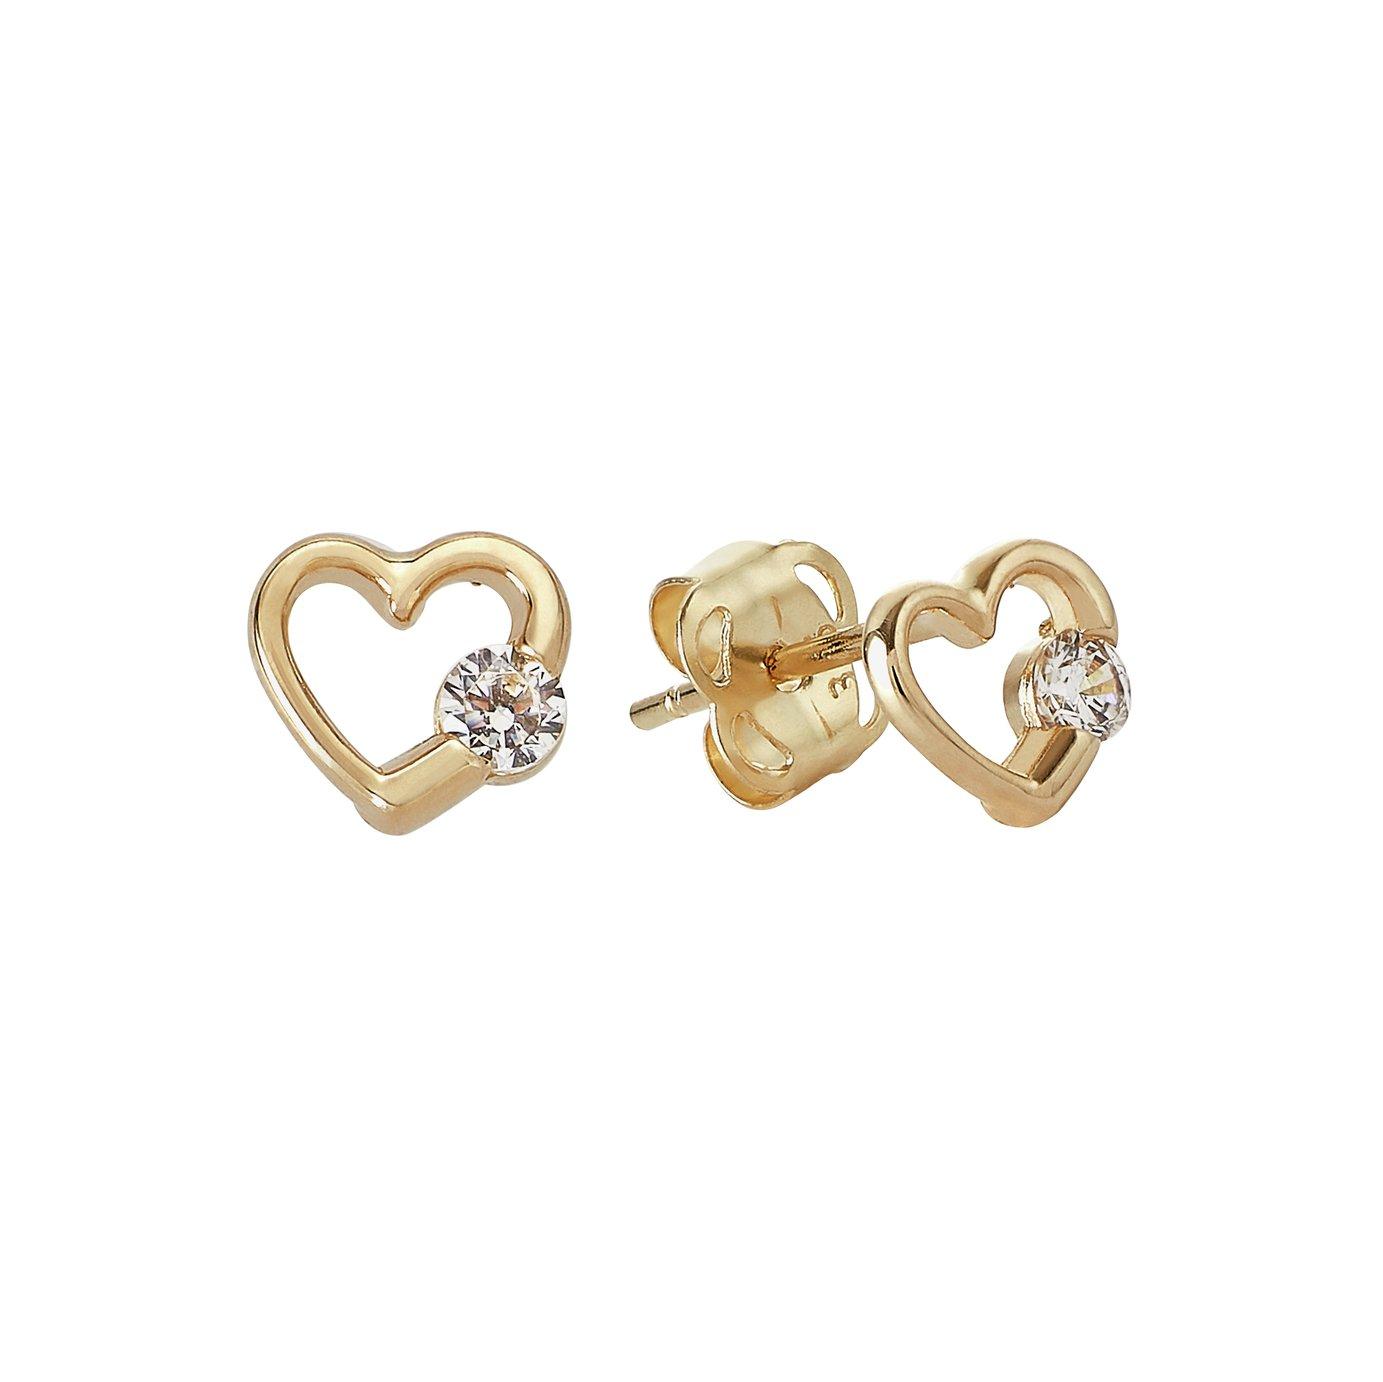 Revere Kid's 9ct Gold Cubic Zirconia Heart Stud Earrings